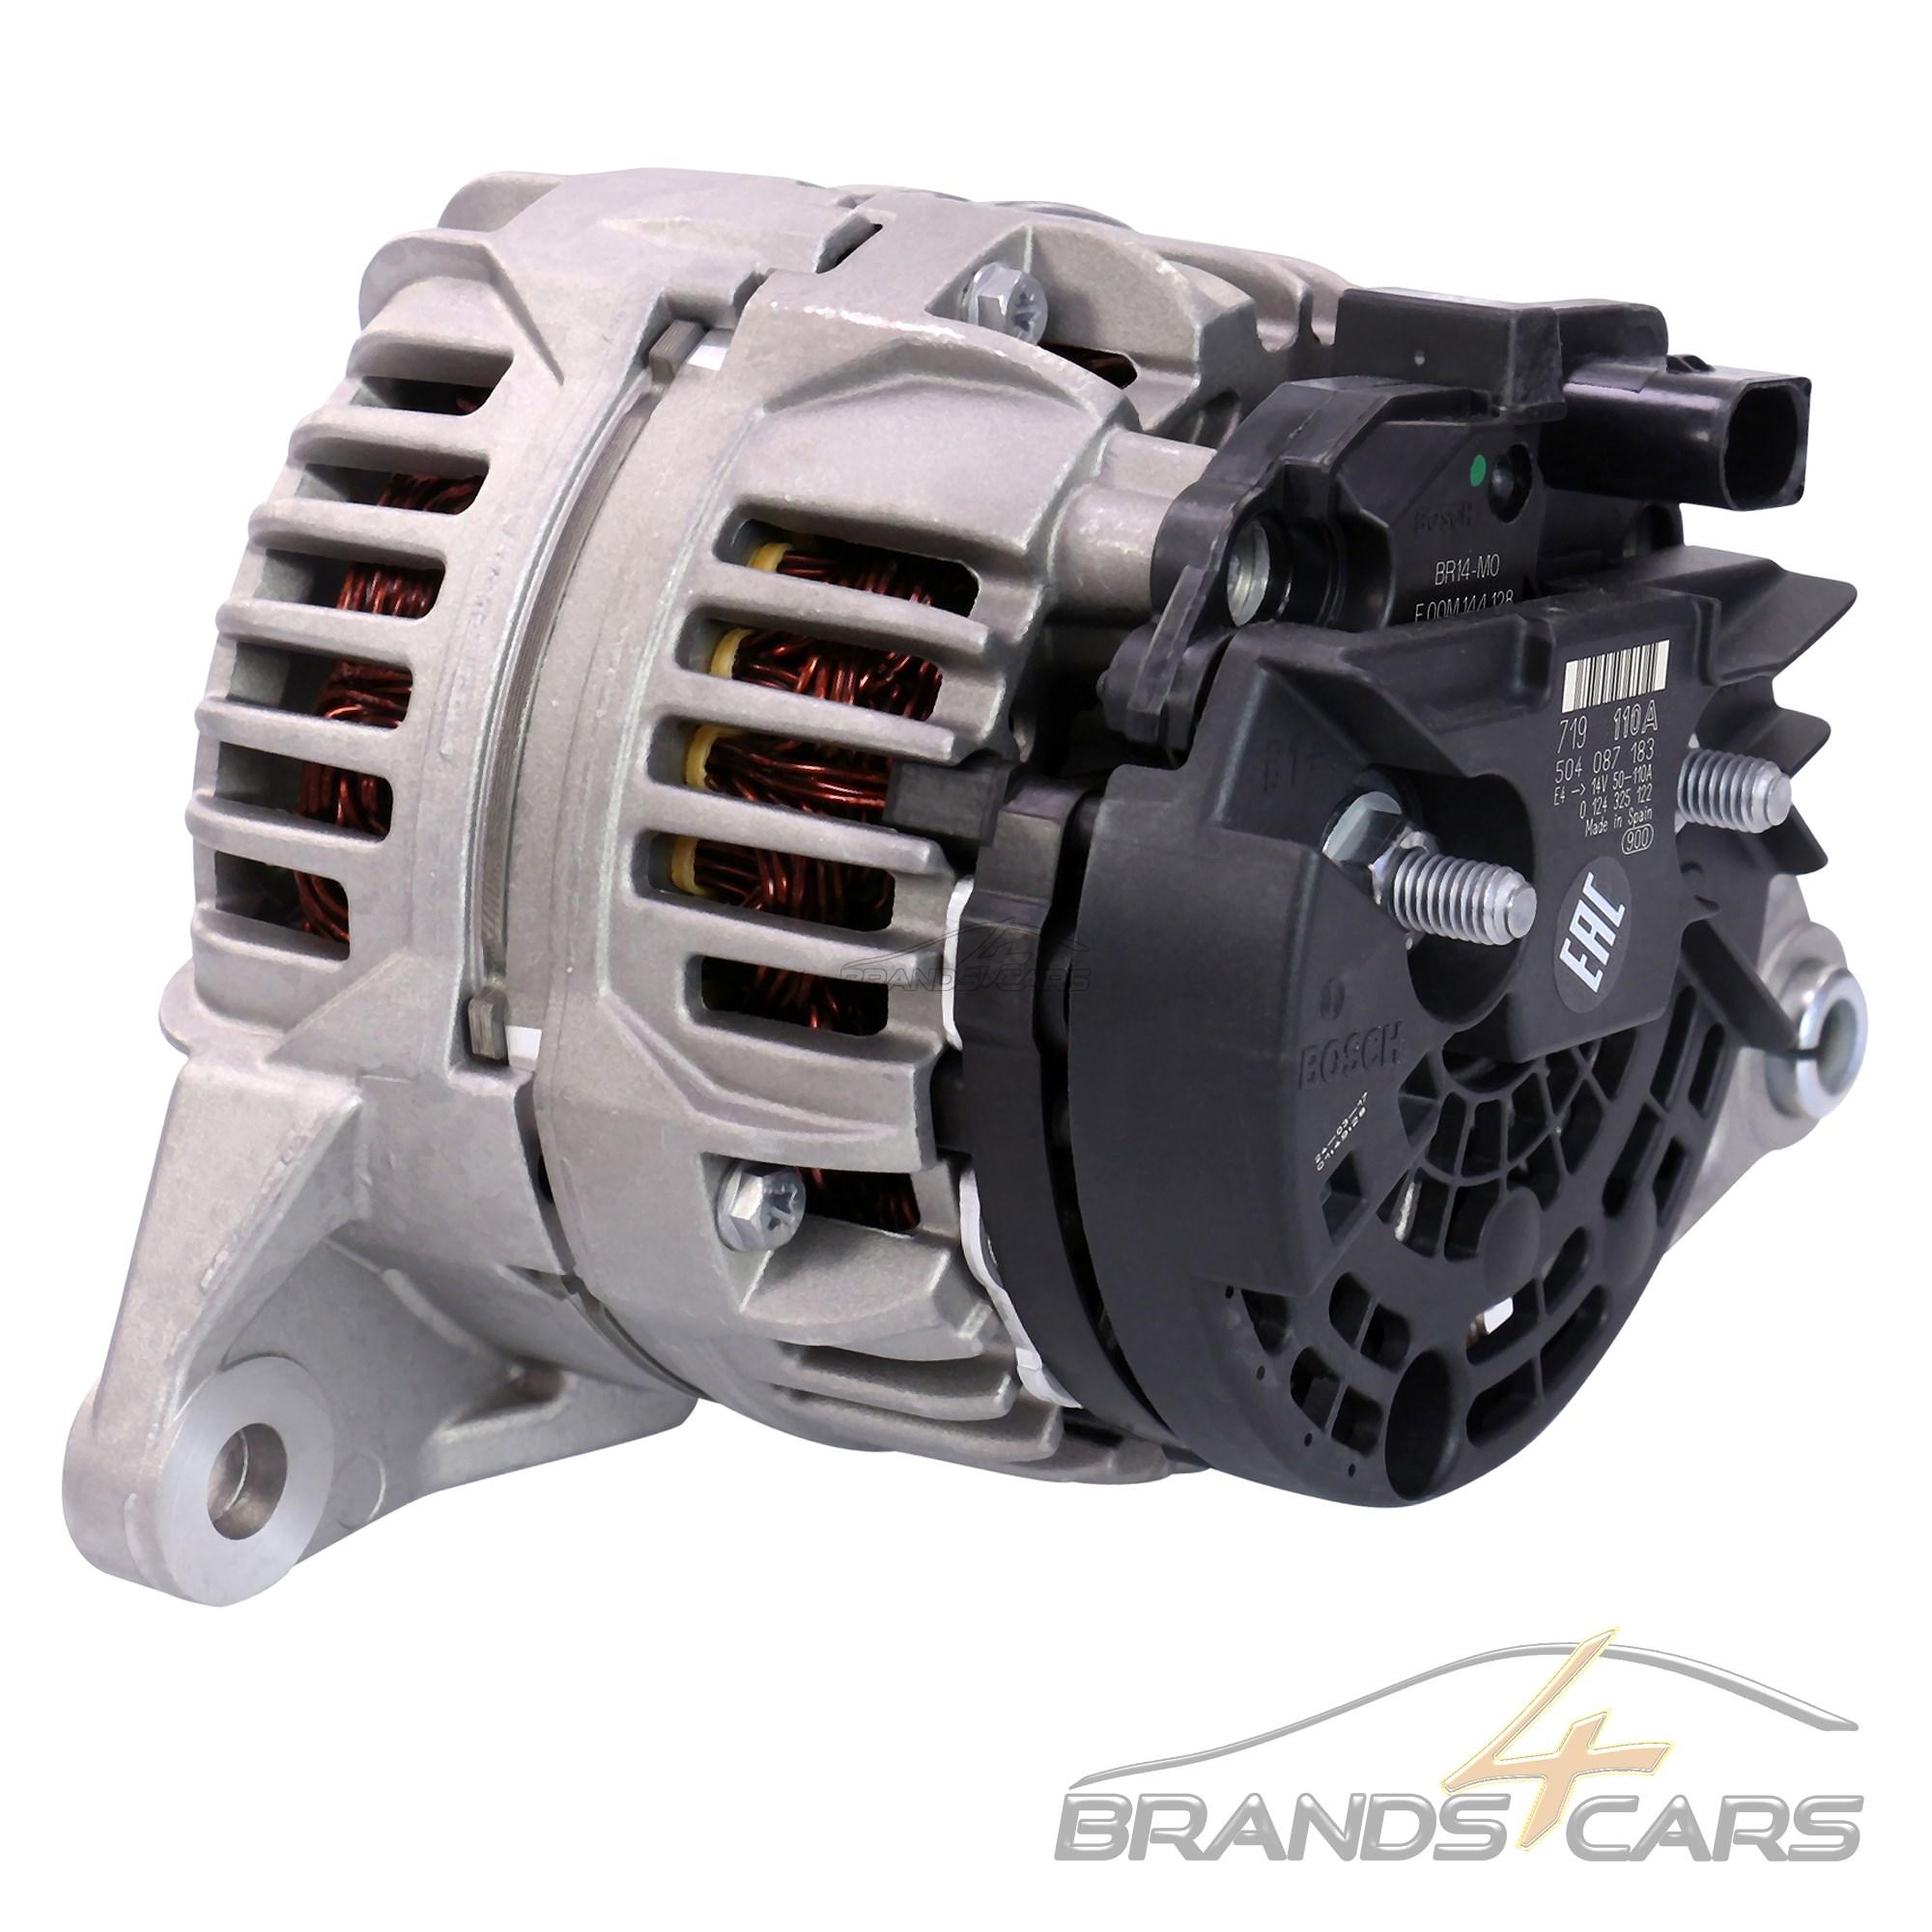 Bosch alternador generador 110-a Fiat Ducato 250 BJ 06-14